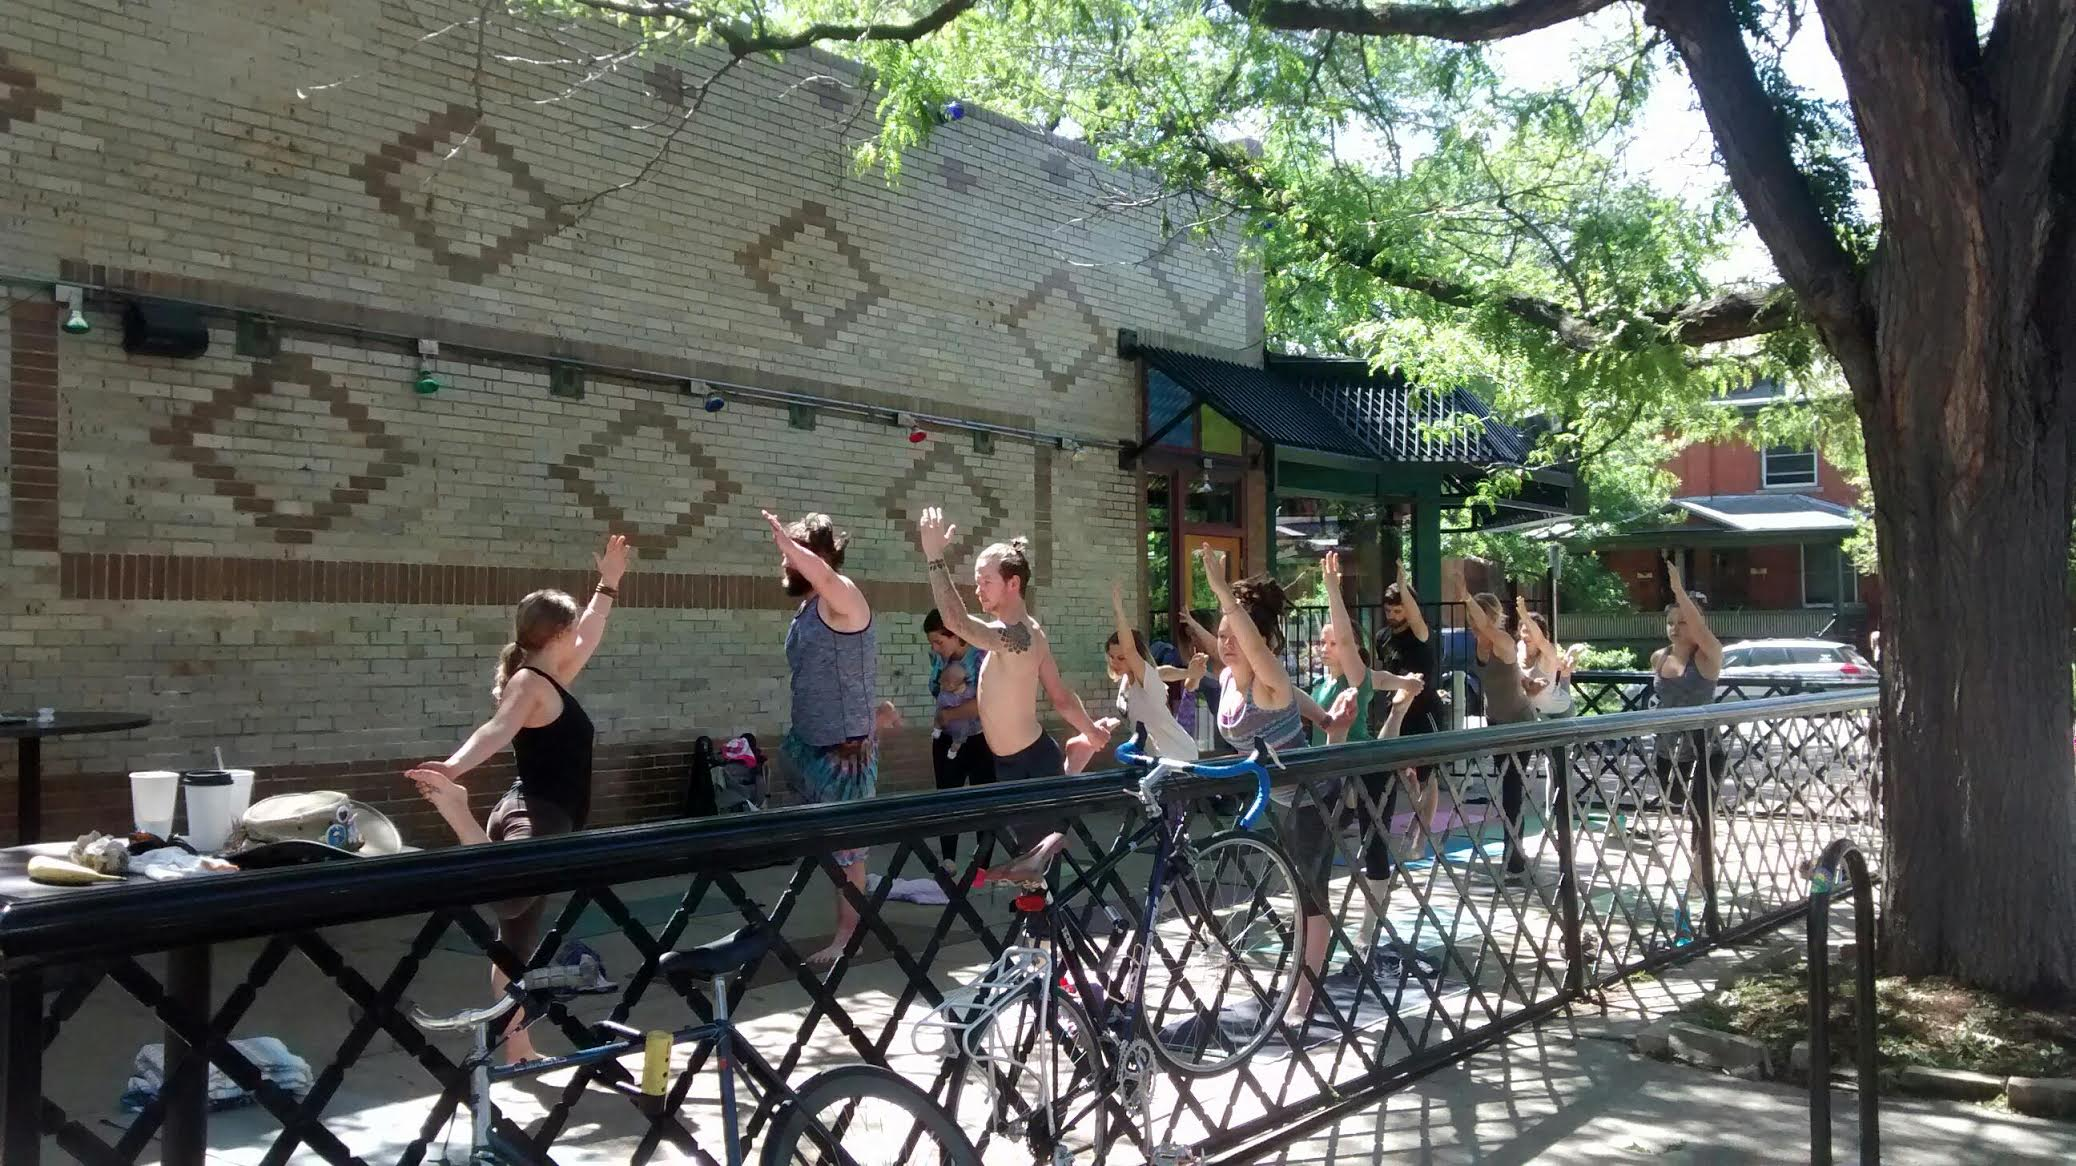 Yoga at Vine Street Pub & Brewery